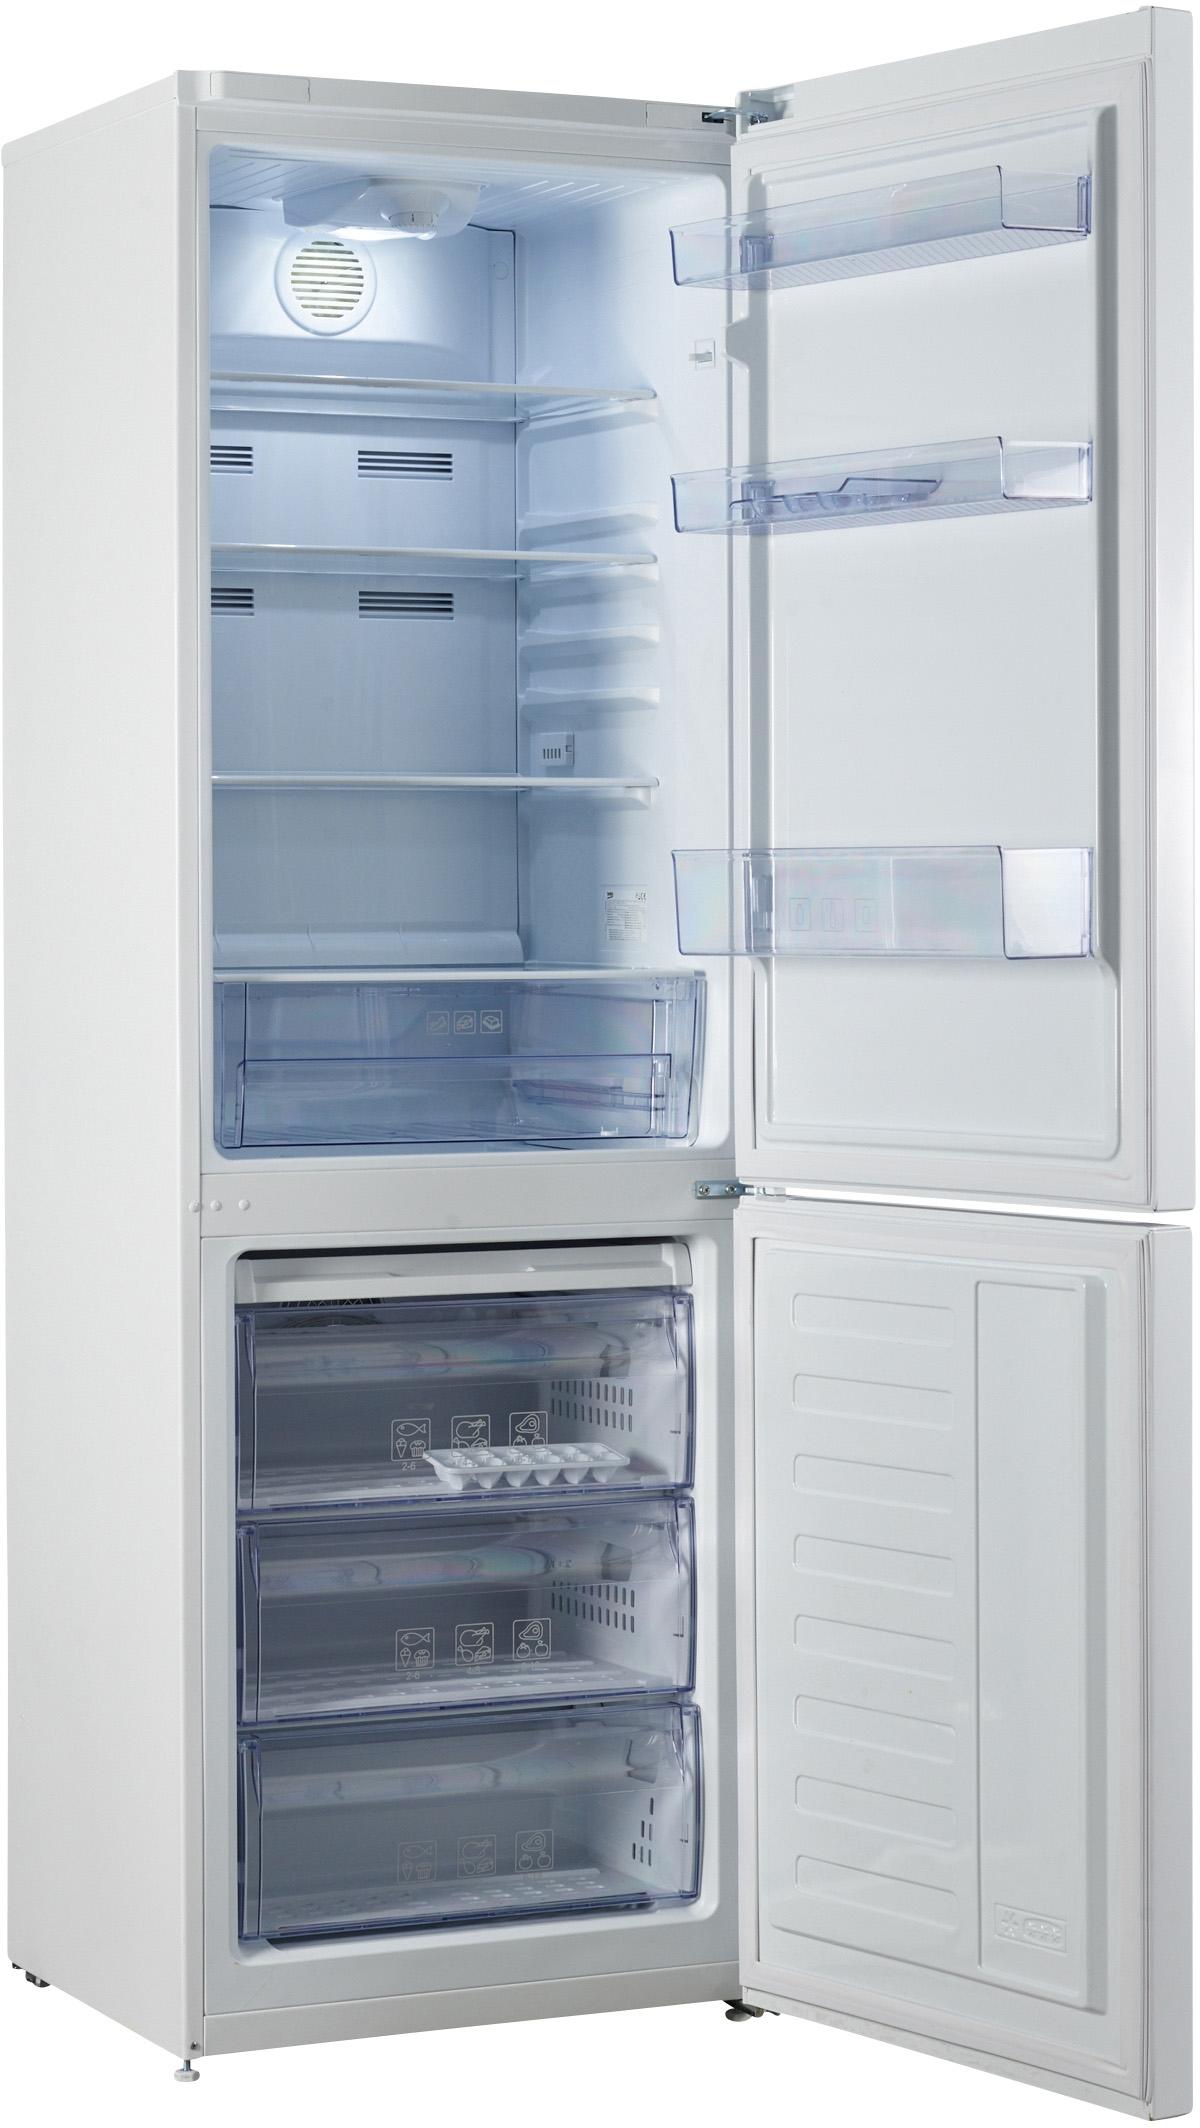 I dettagli del test sul frigorifero BEKO RCNA320K20W